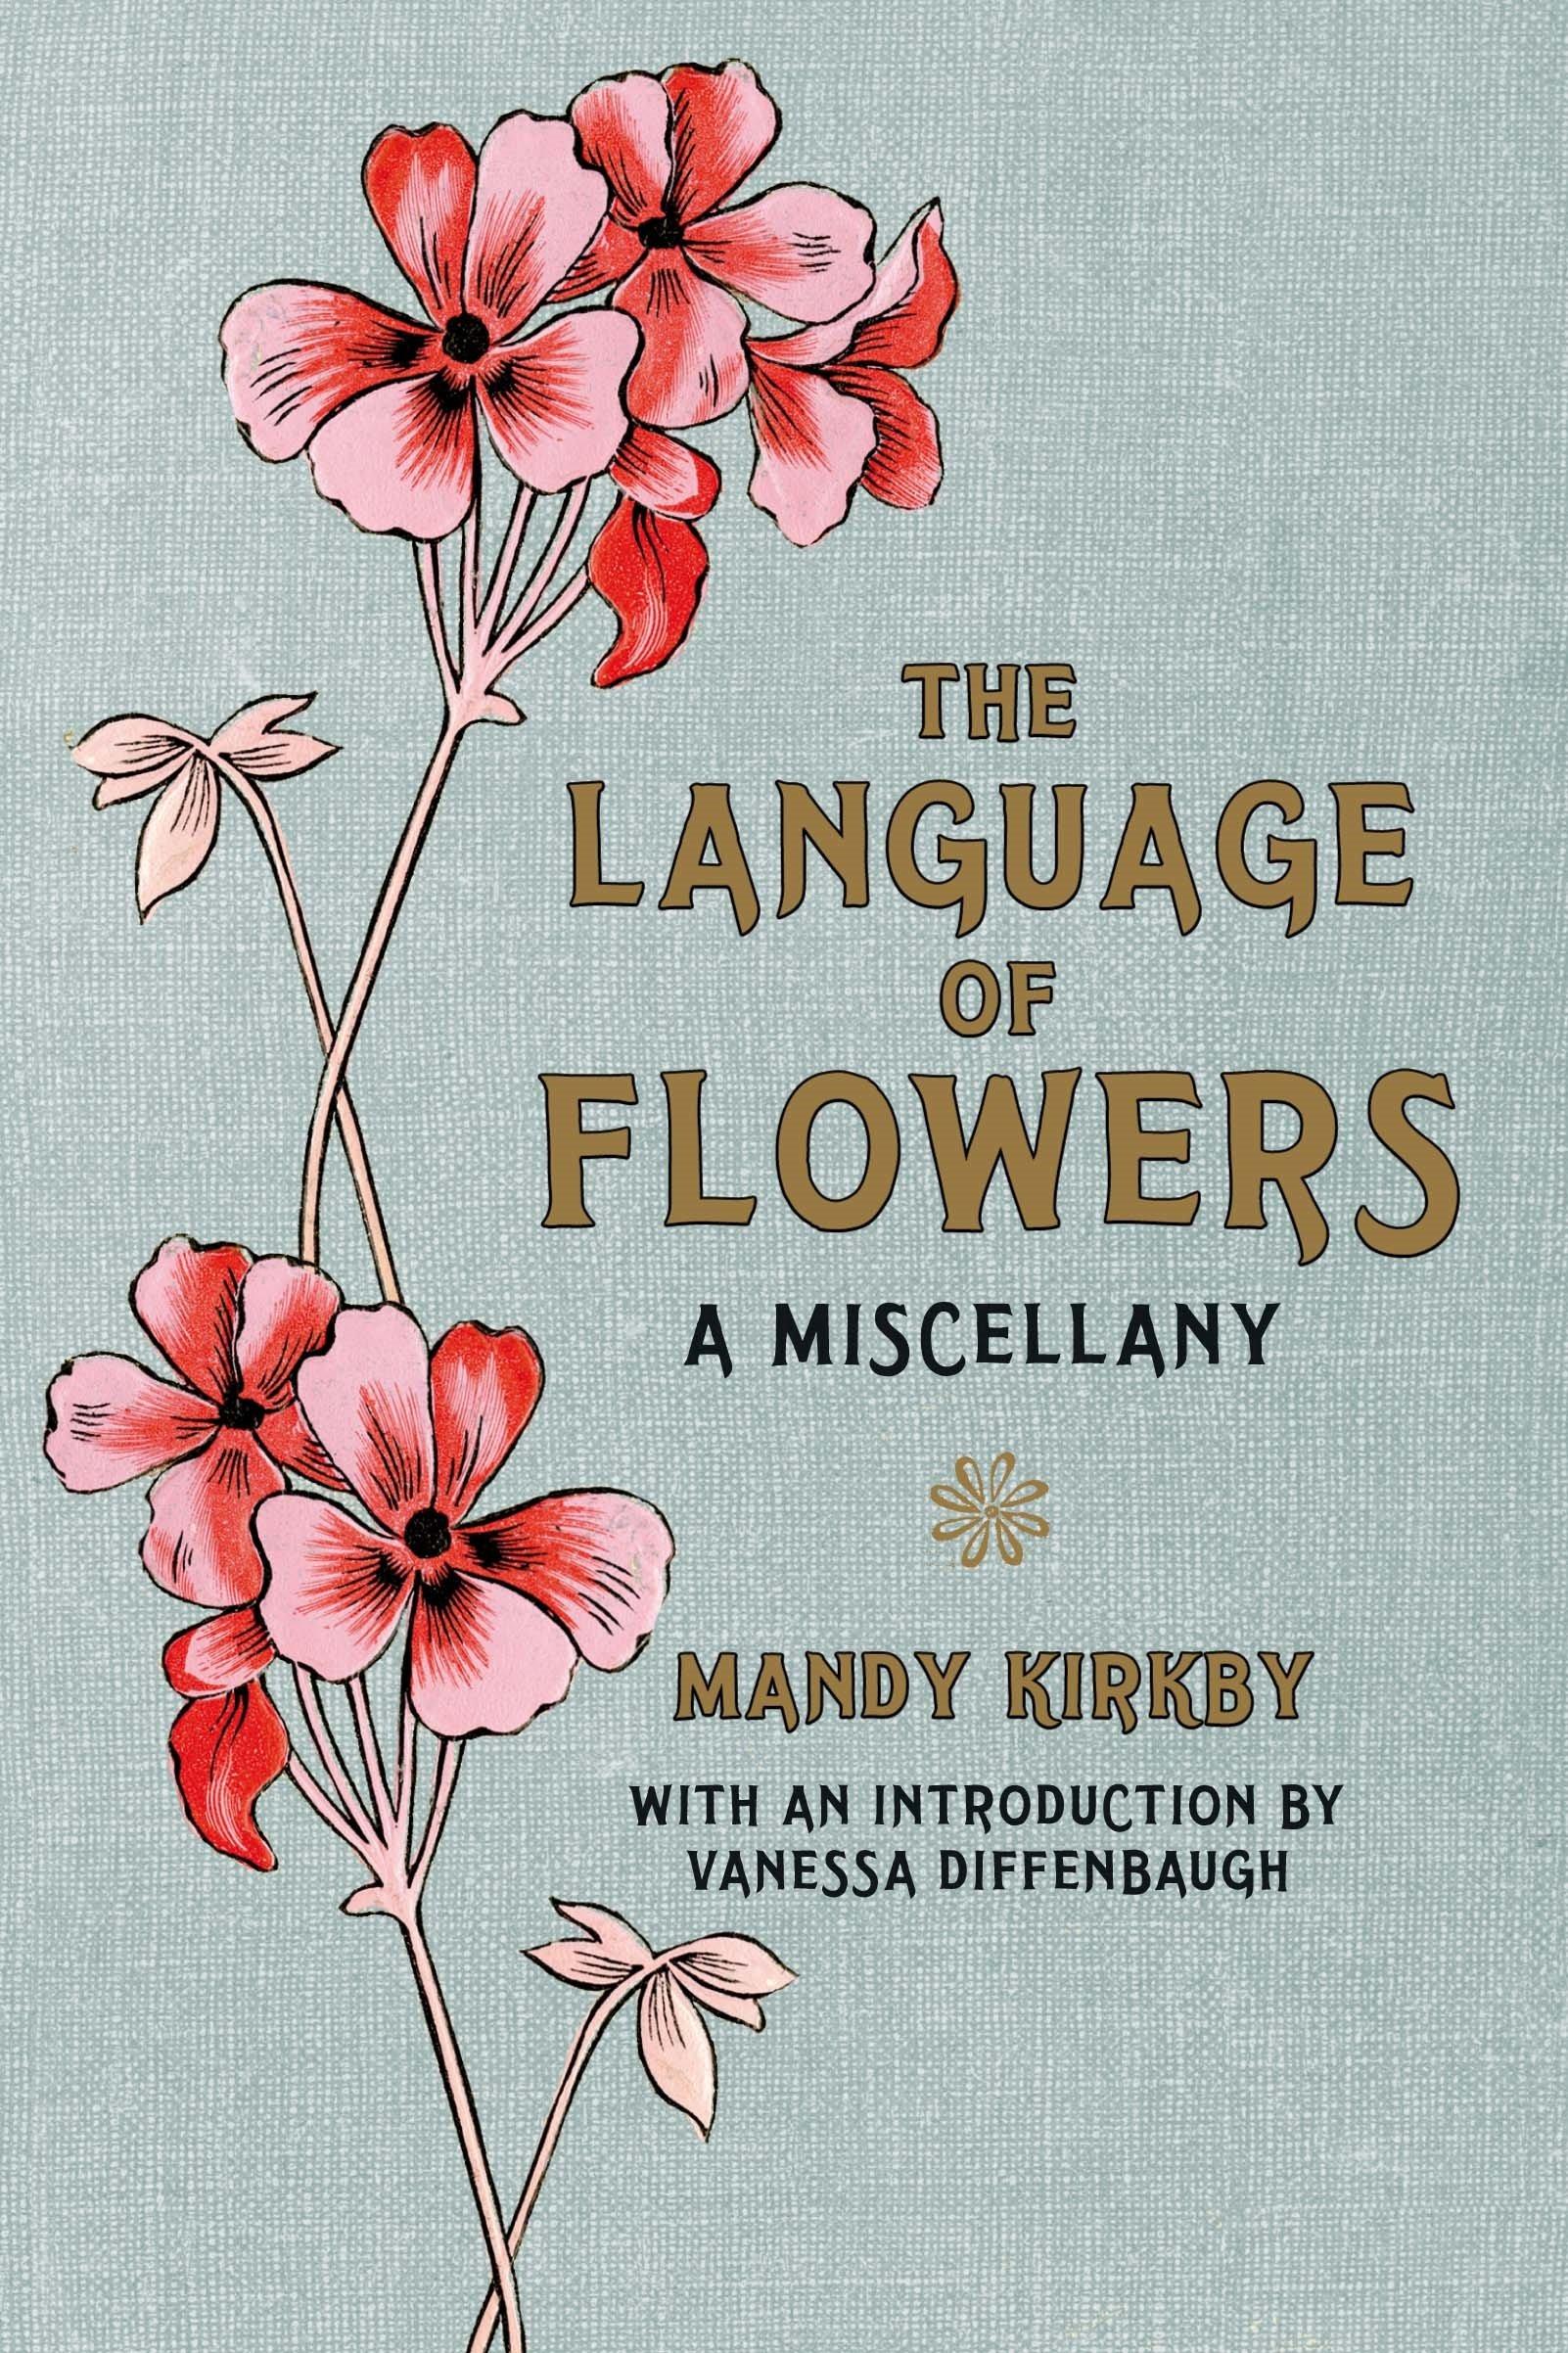 The language of flowers gift book amazon mandy kirkby the language of flowers gift book amazon mandy kirkby vanessa diffenbaugh 0884892056617 books izmirmasajfo